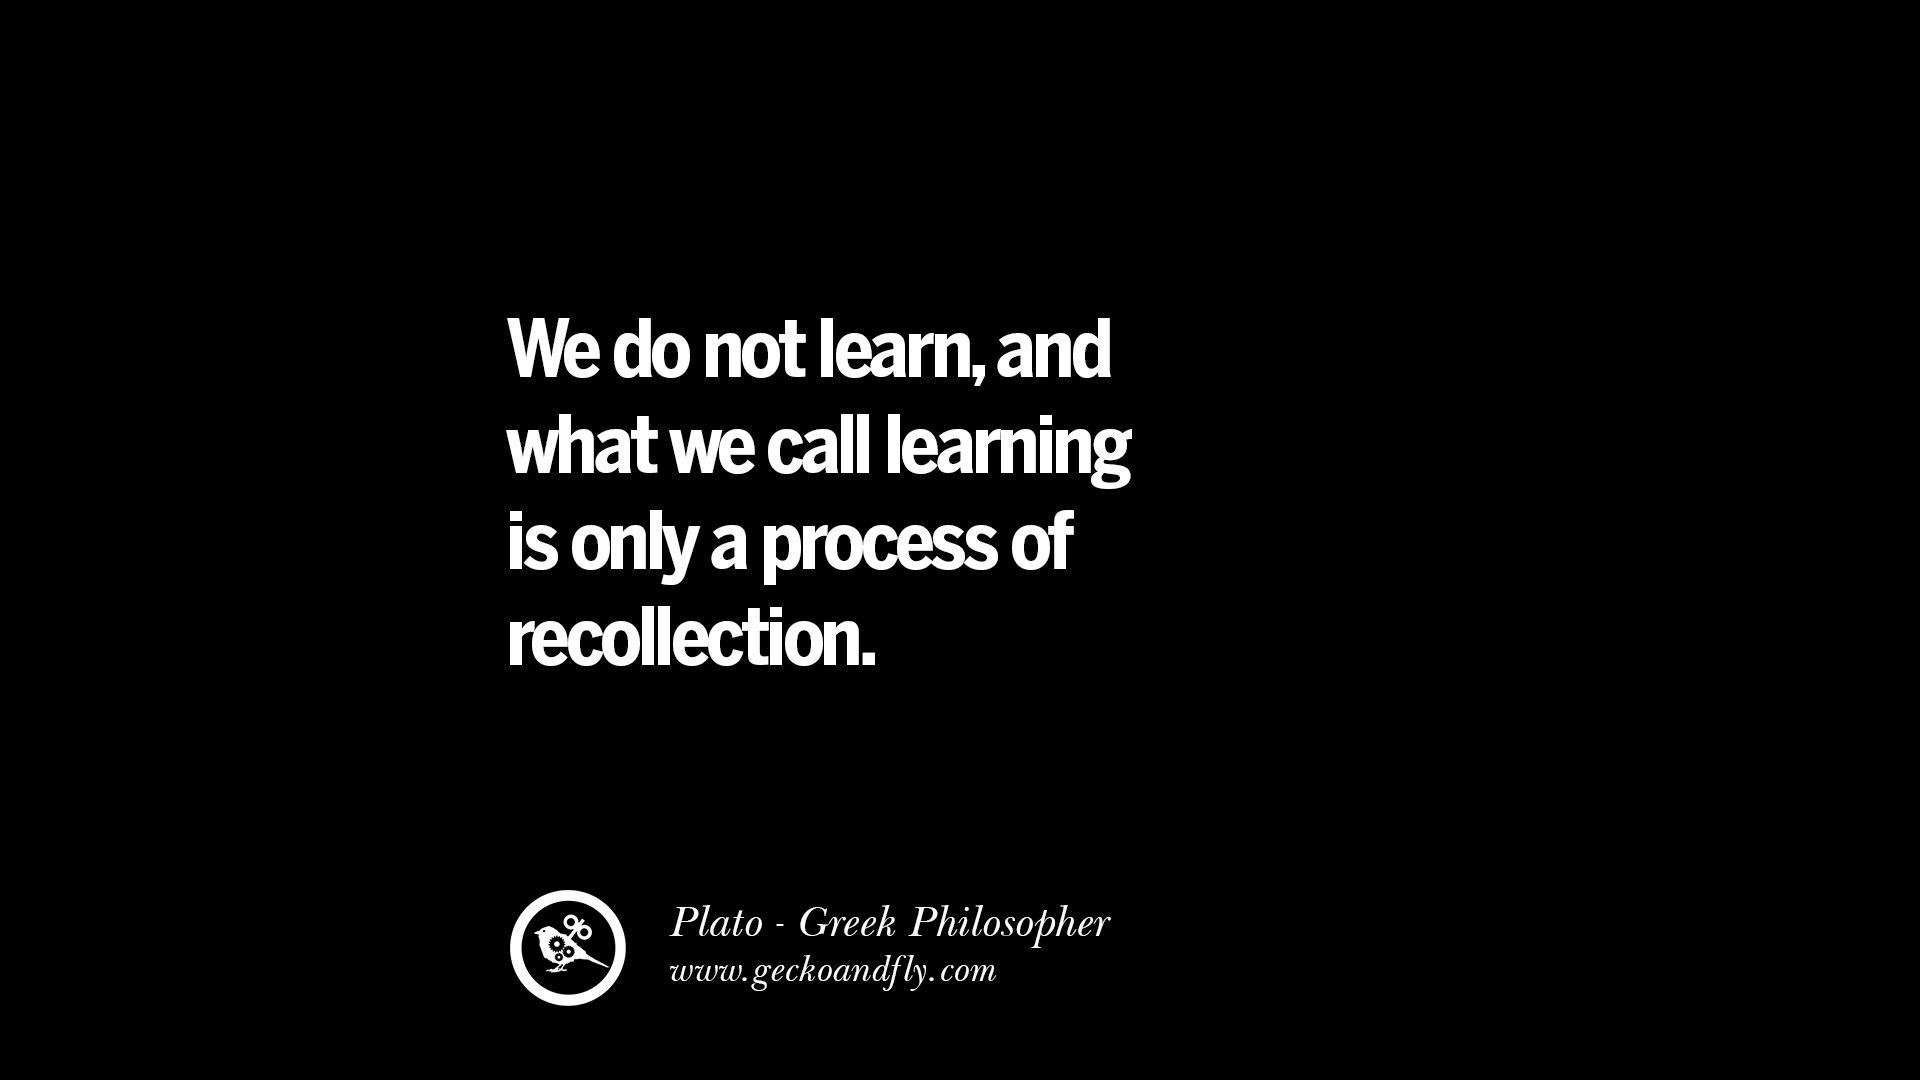 Simplicity negative quotes